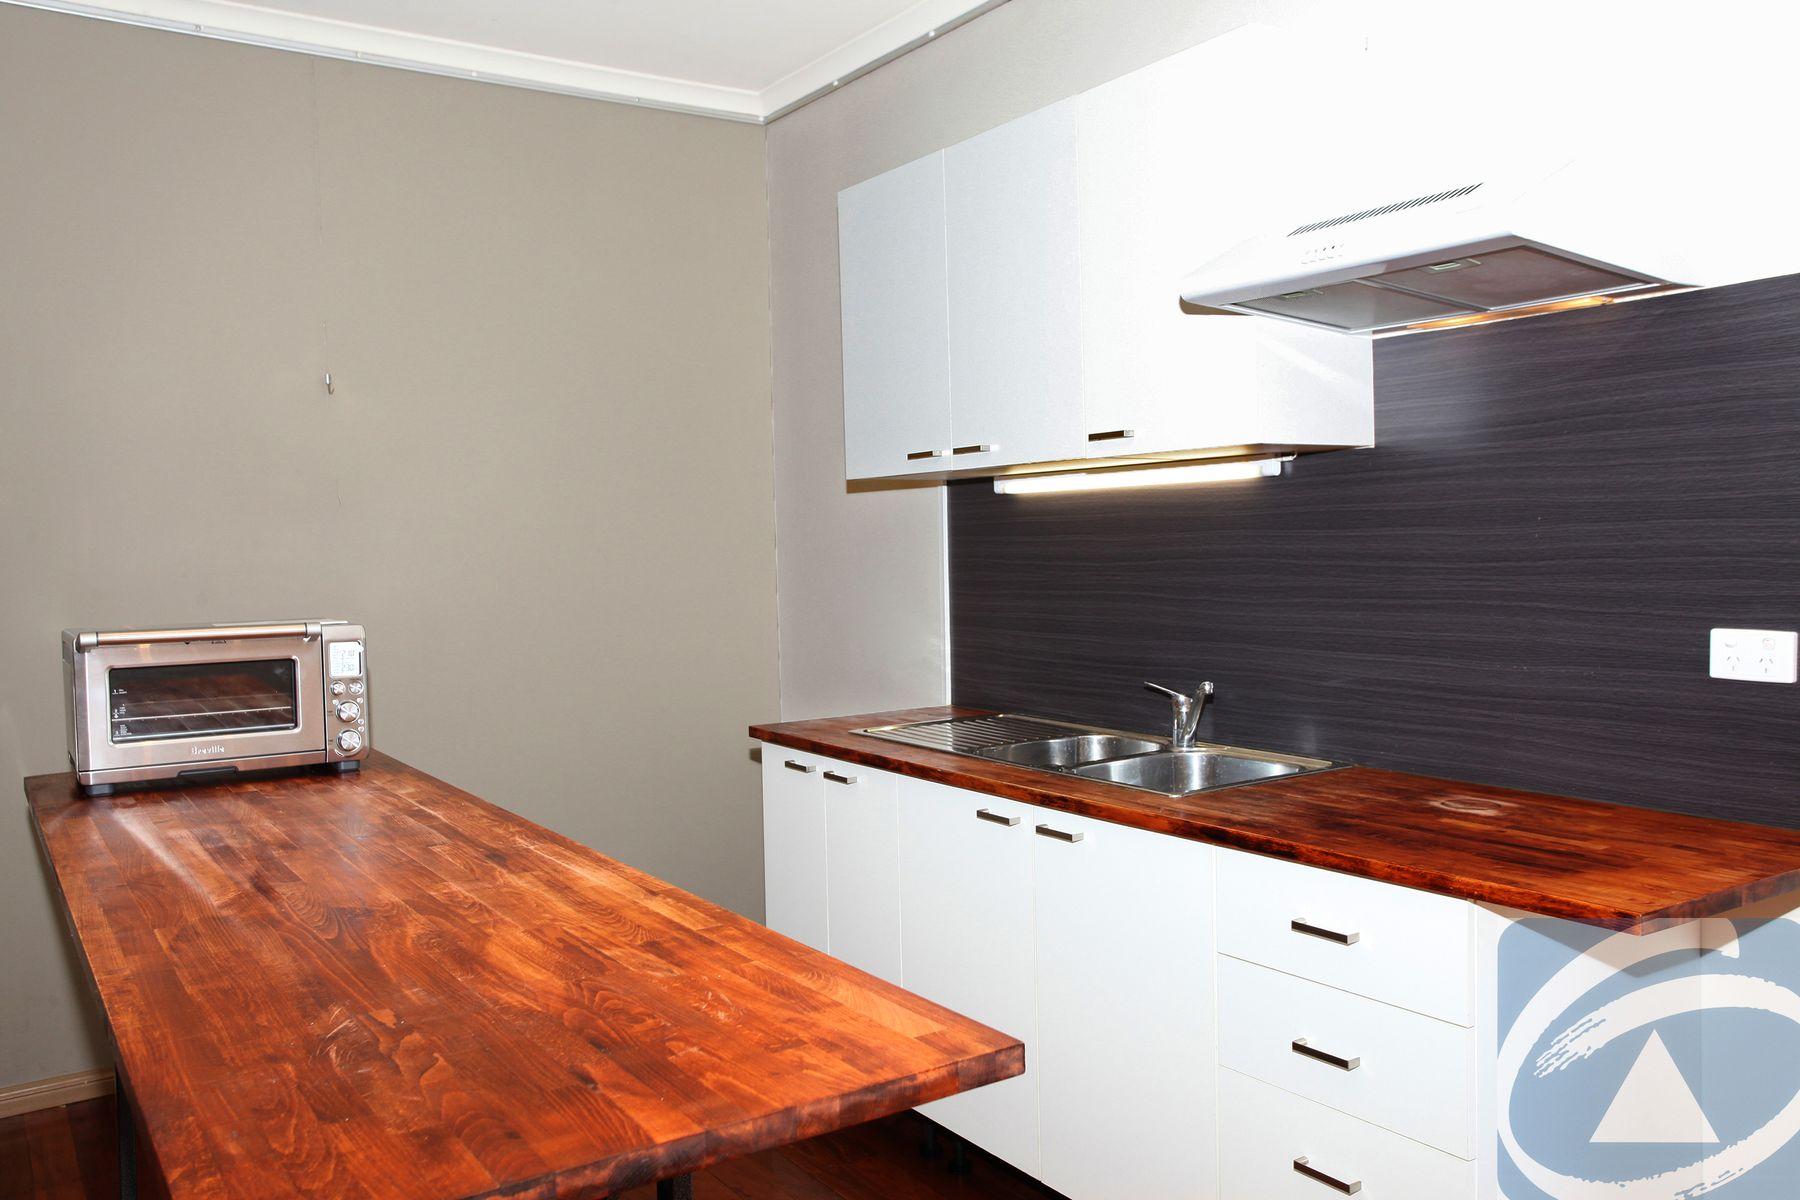 2/19 Matthew Street, Nambour, QLD 4560